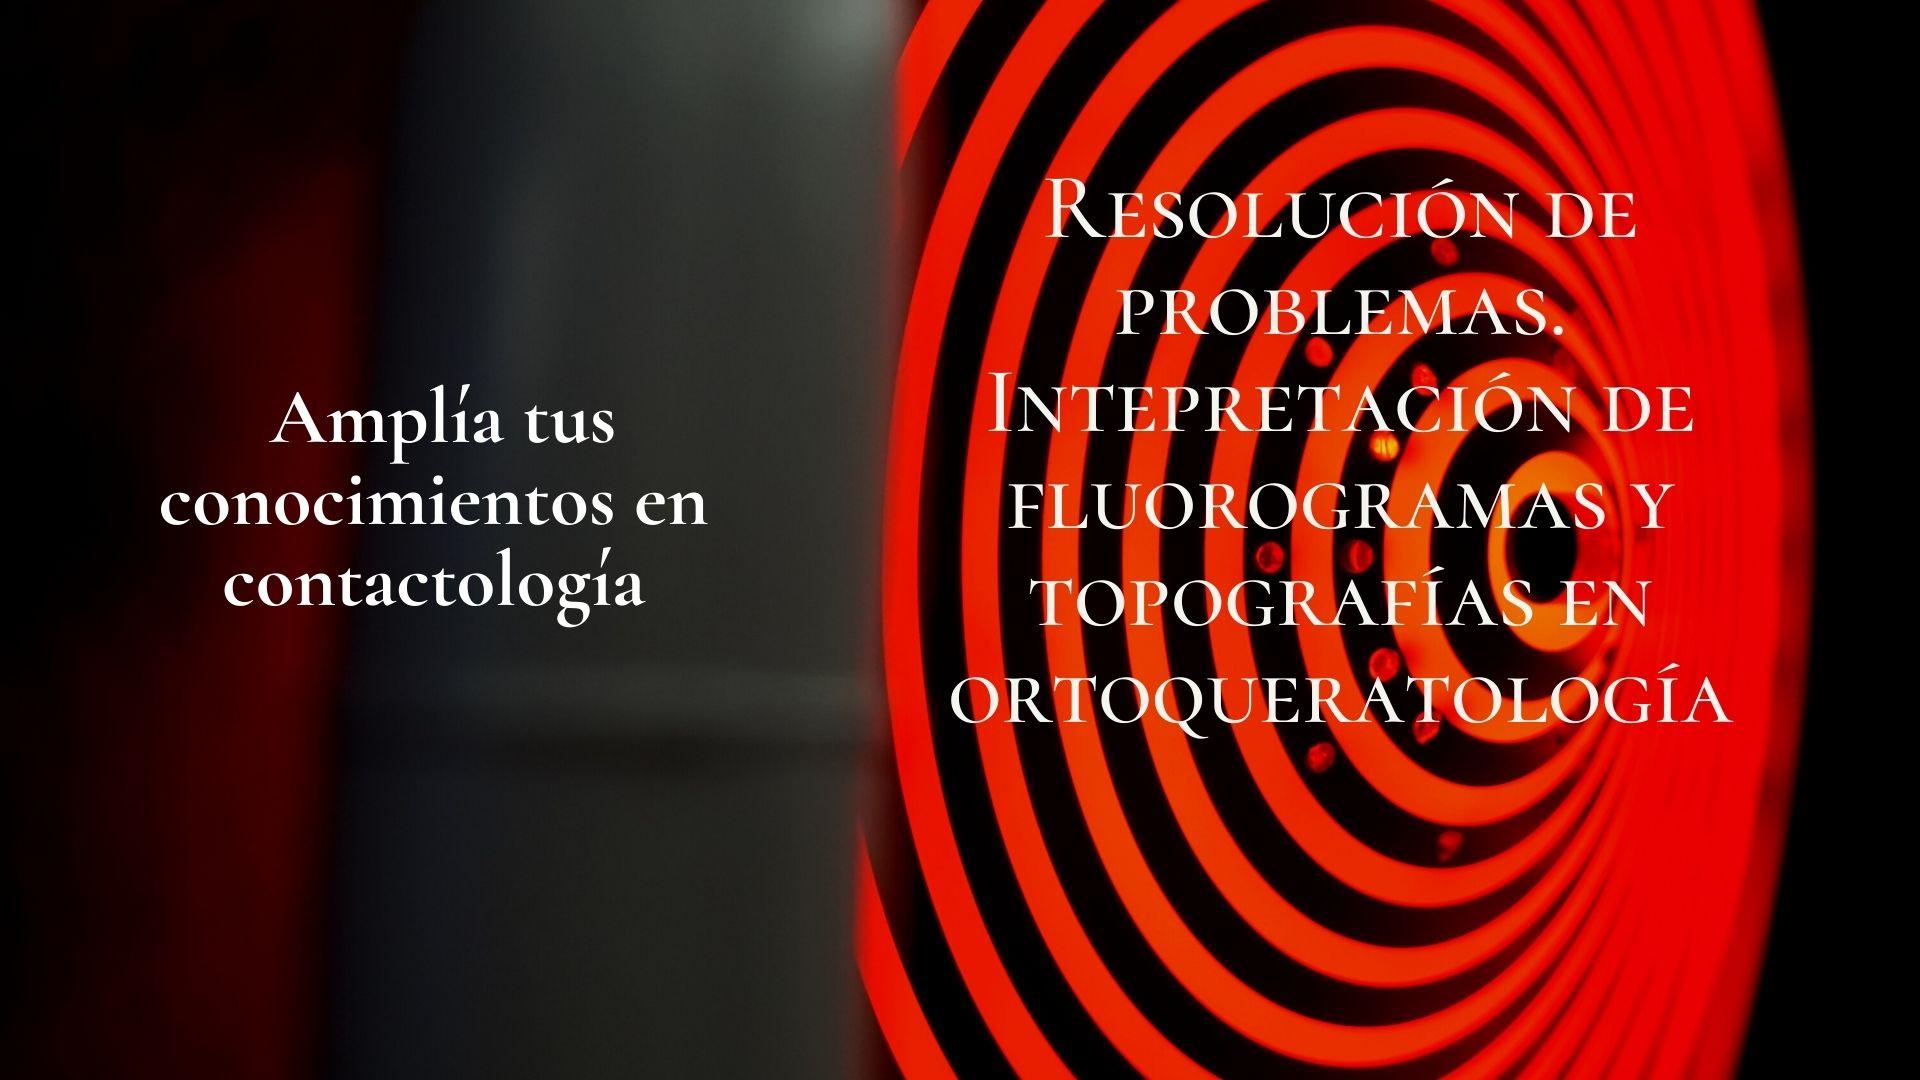 nivell 2 frase2 castellano.jpg